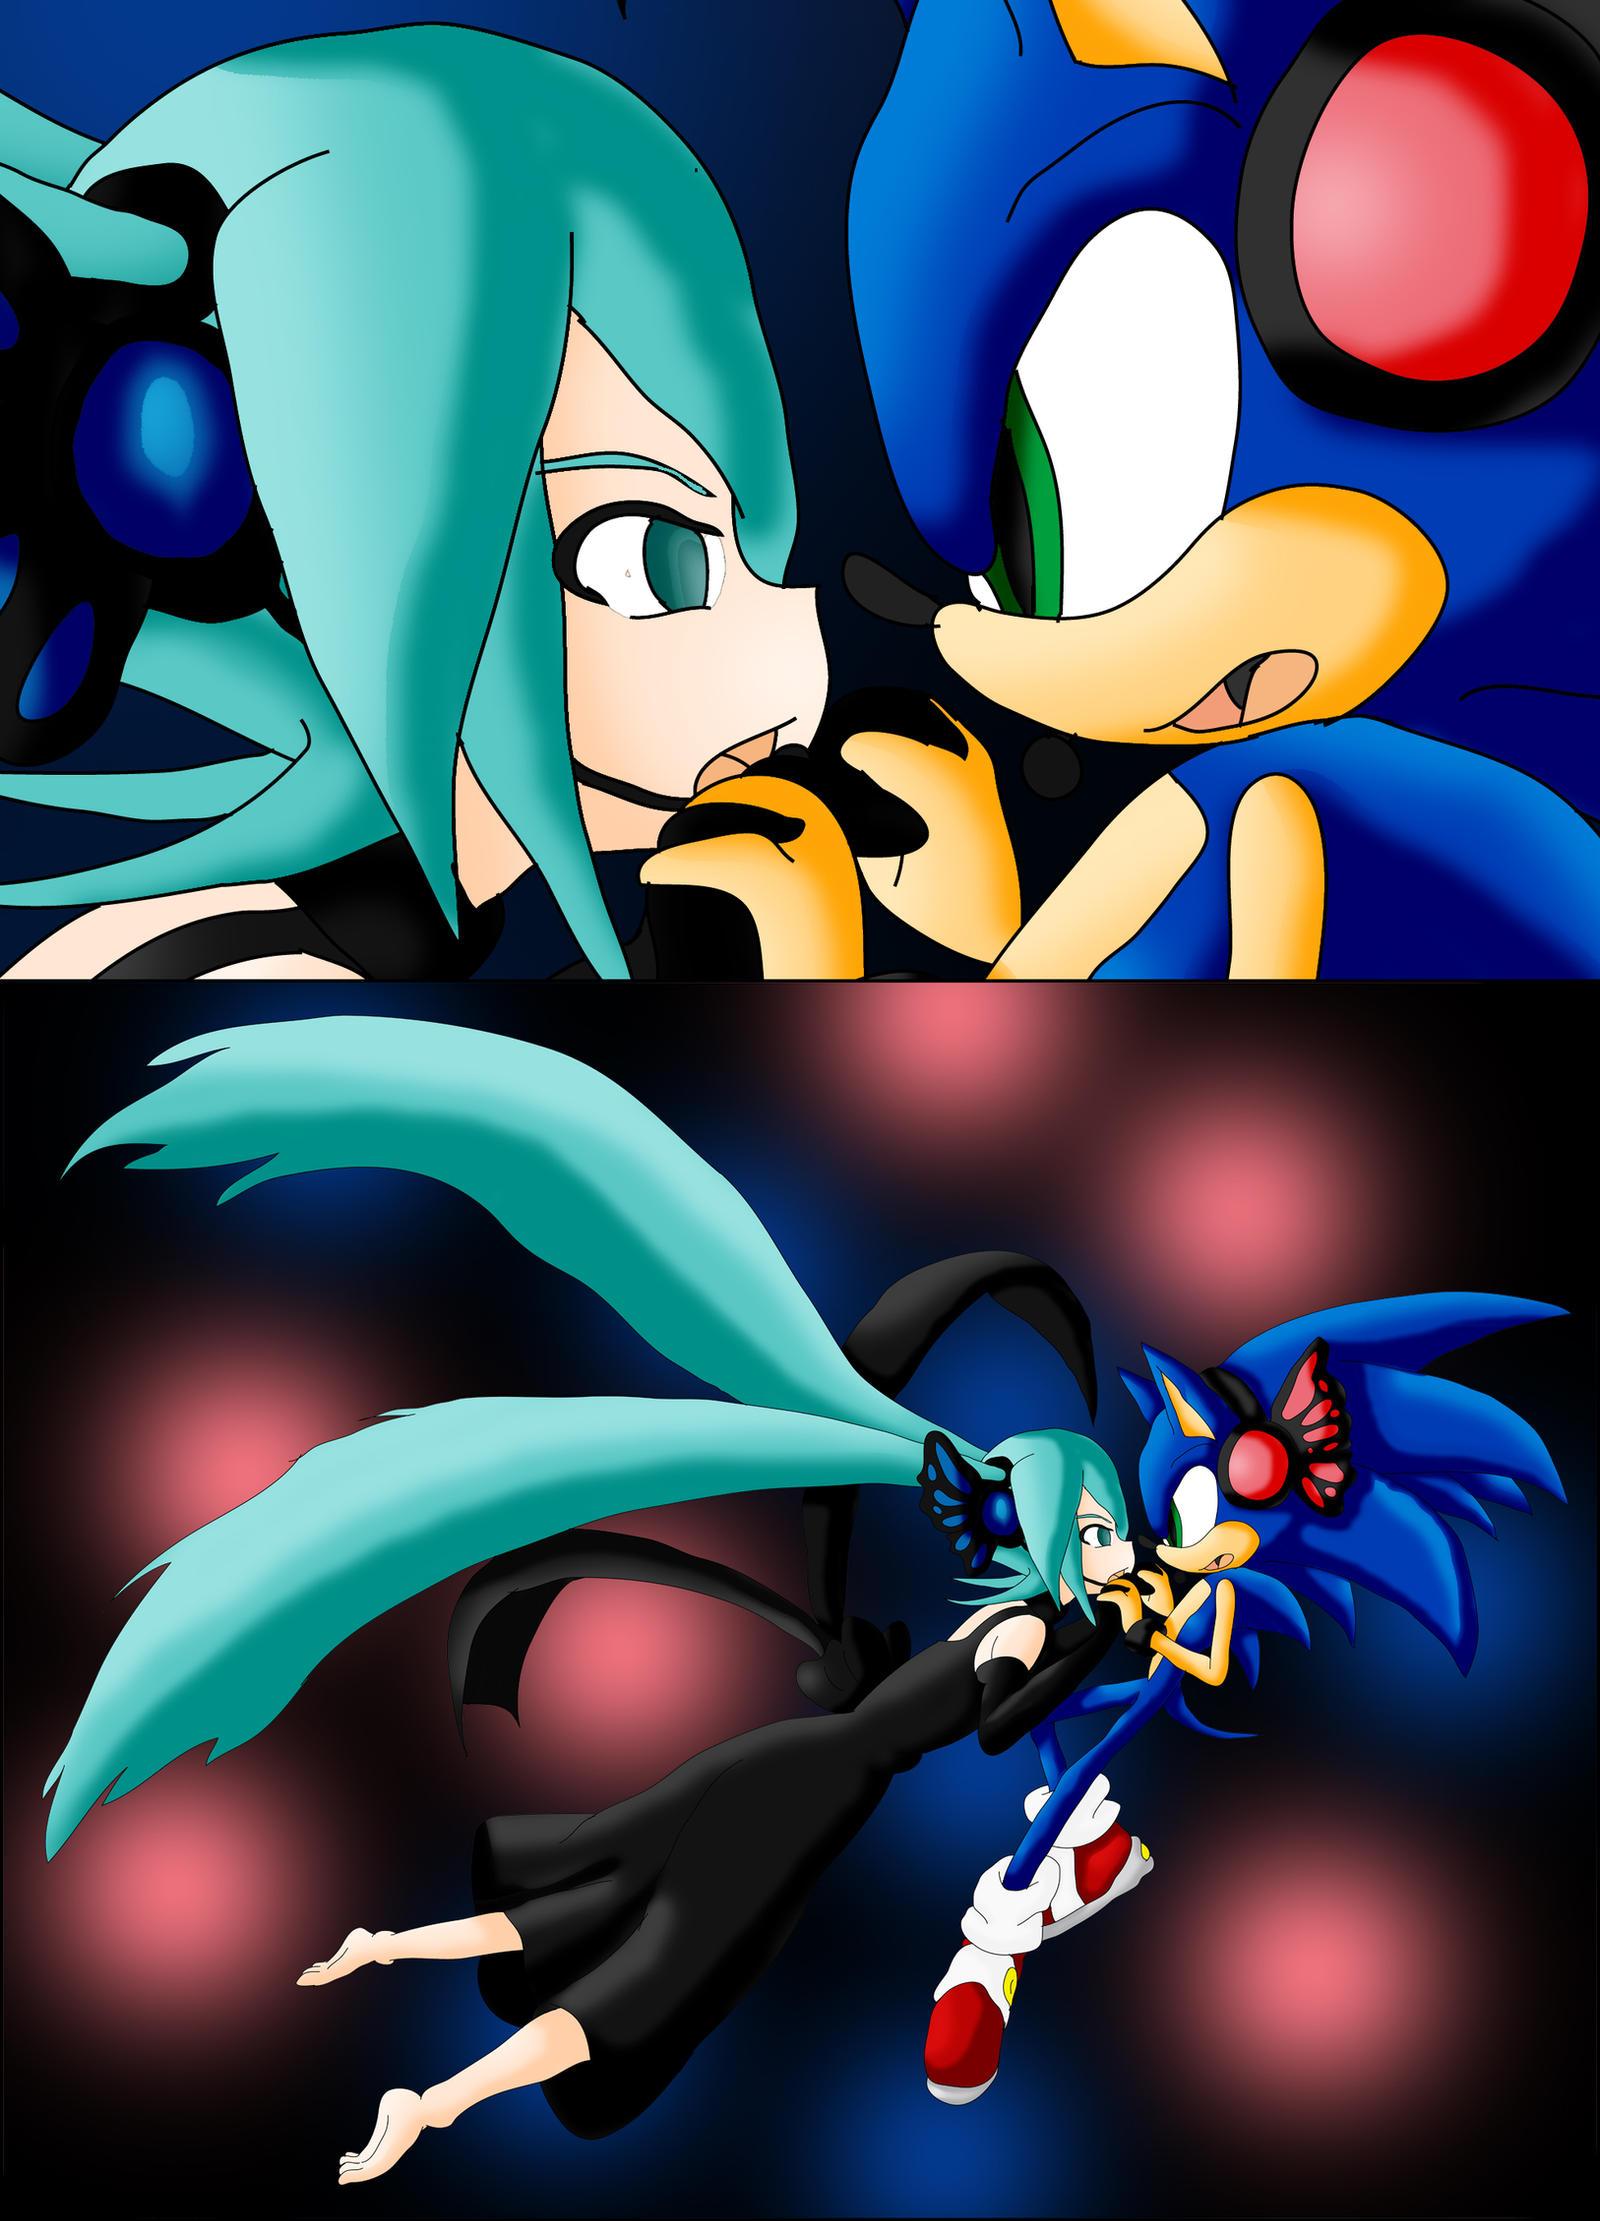 Miku x Sonic: Magnet by Skye-Izumi